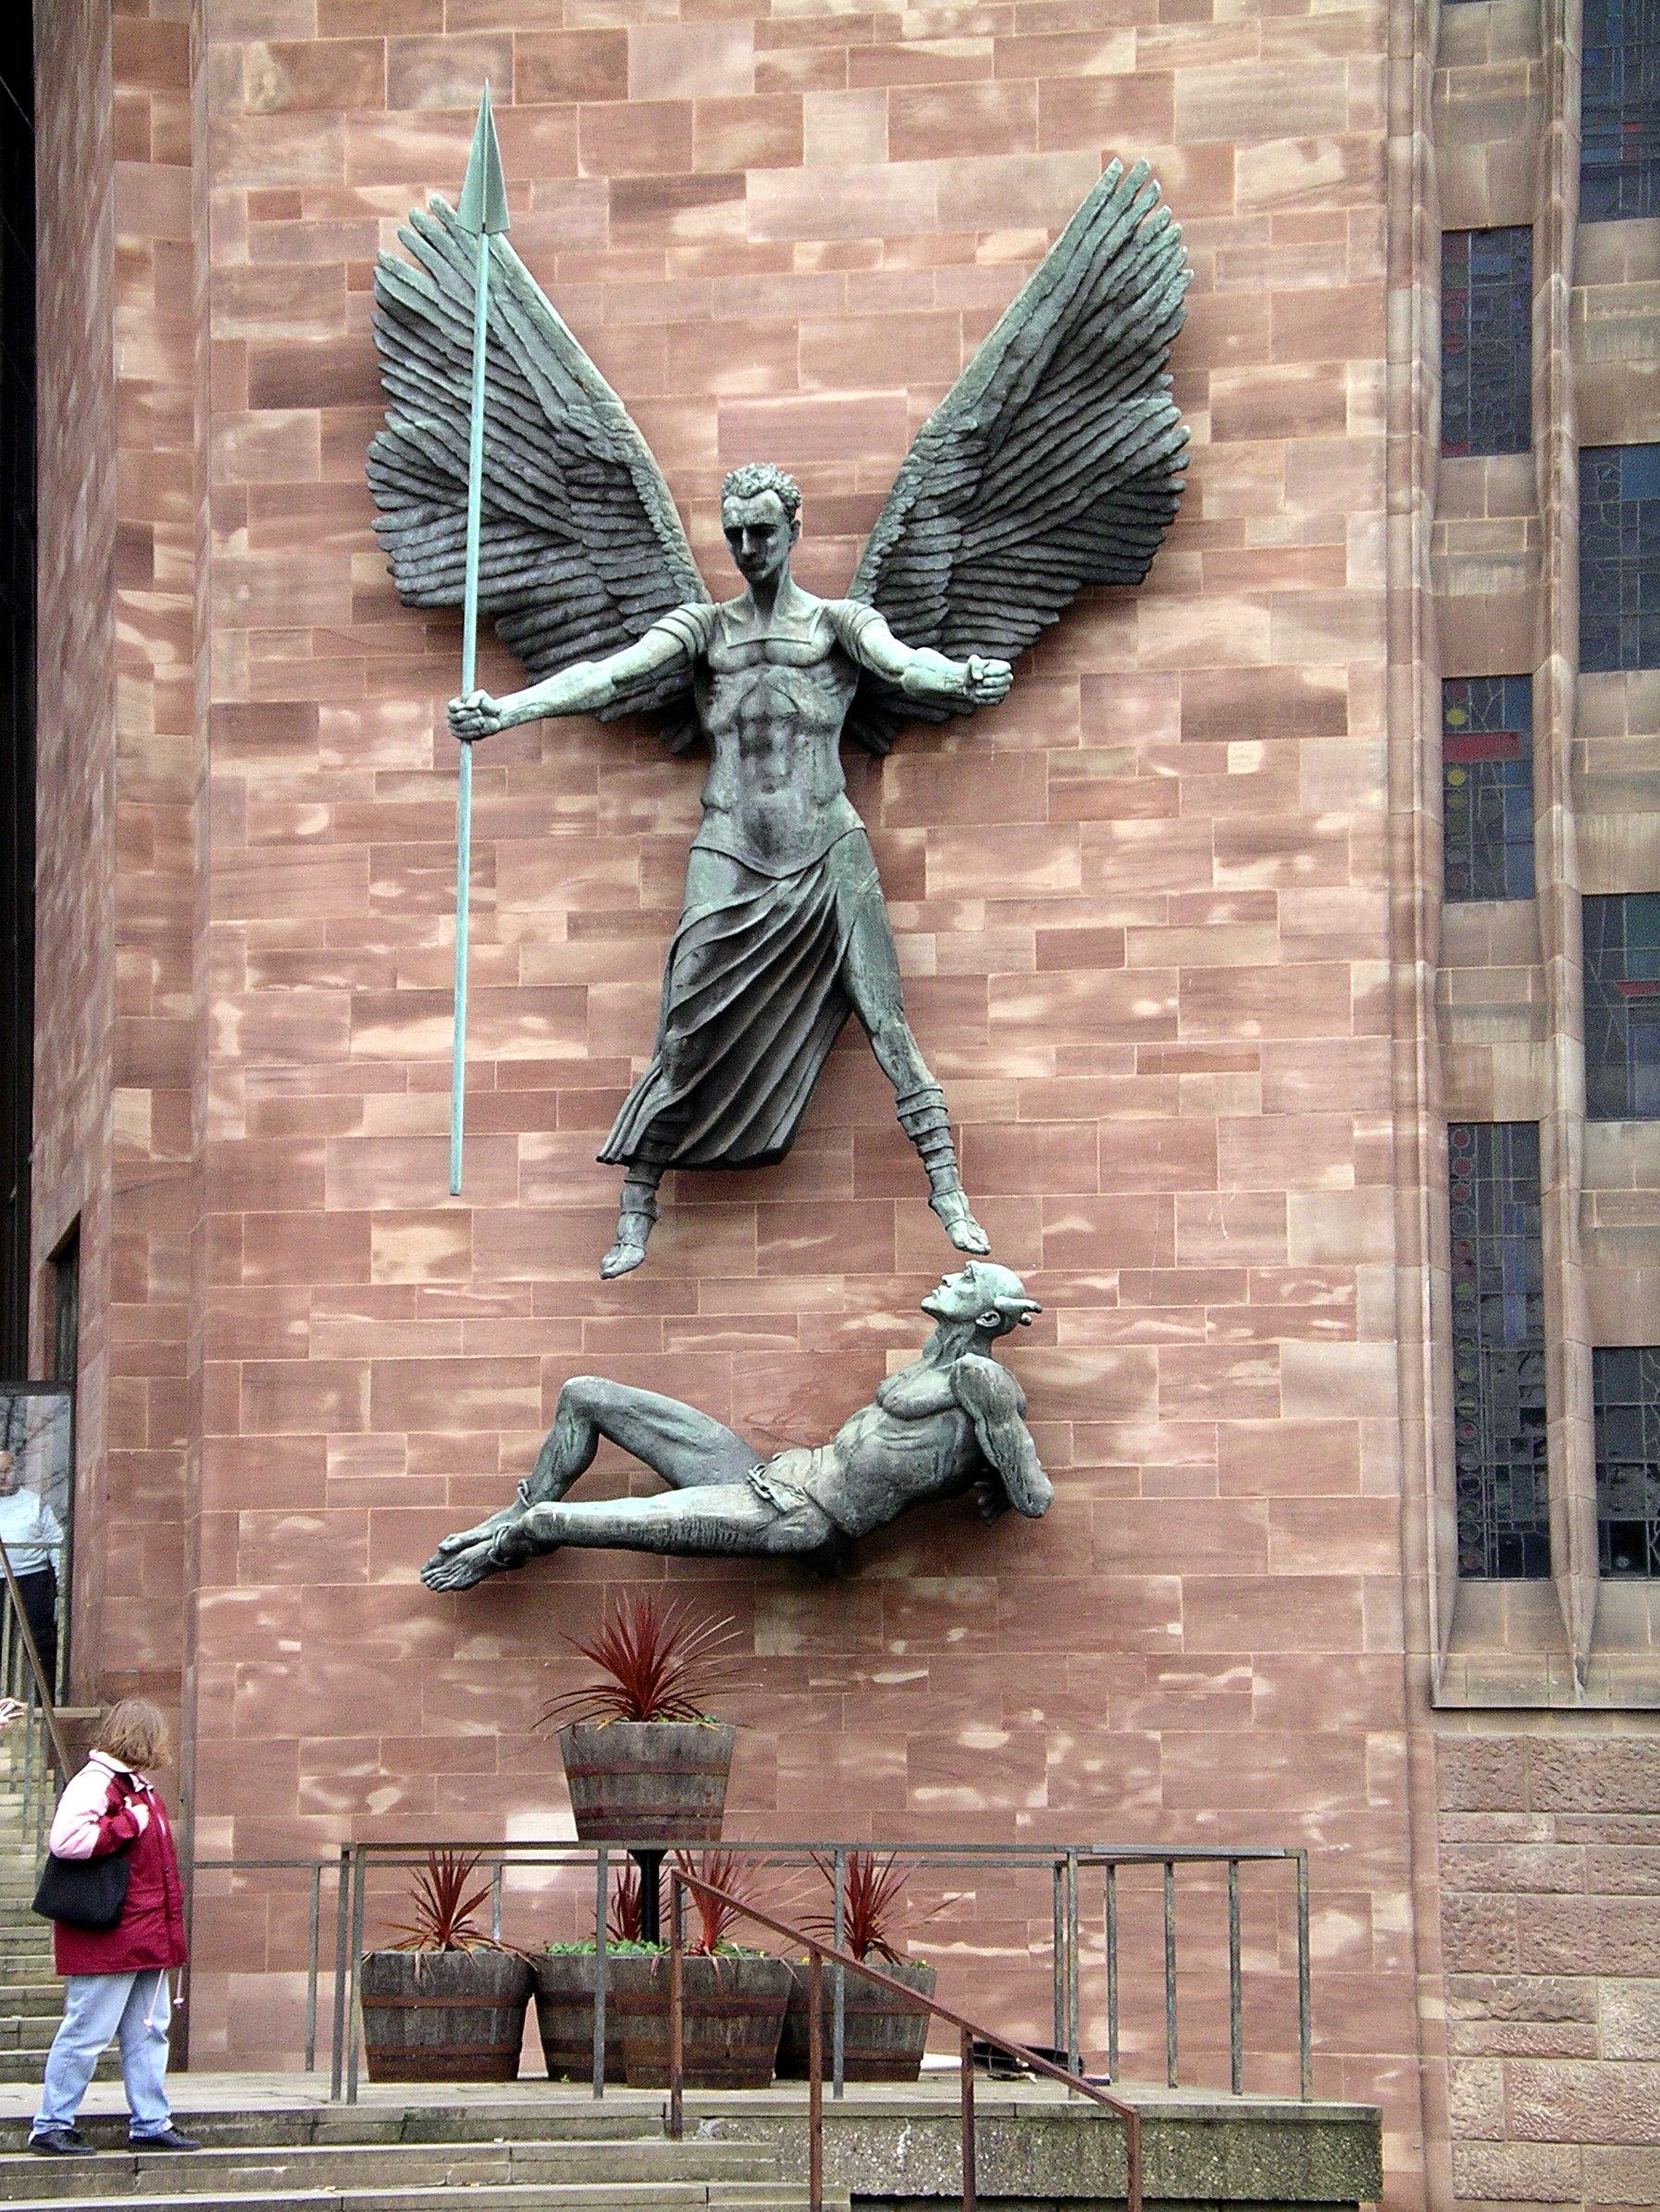 Statue_of_St_Michael_and_the_devil_-_Cov